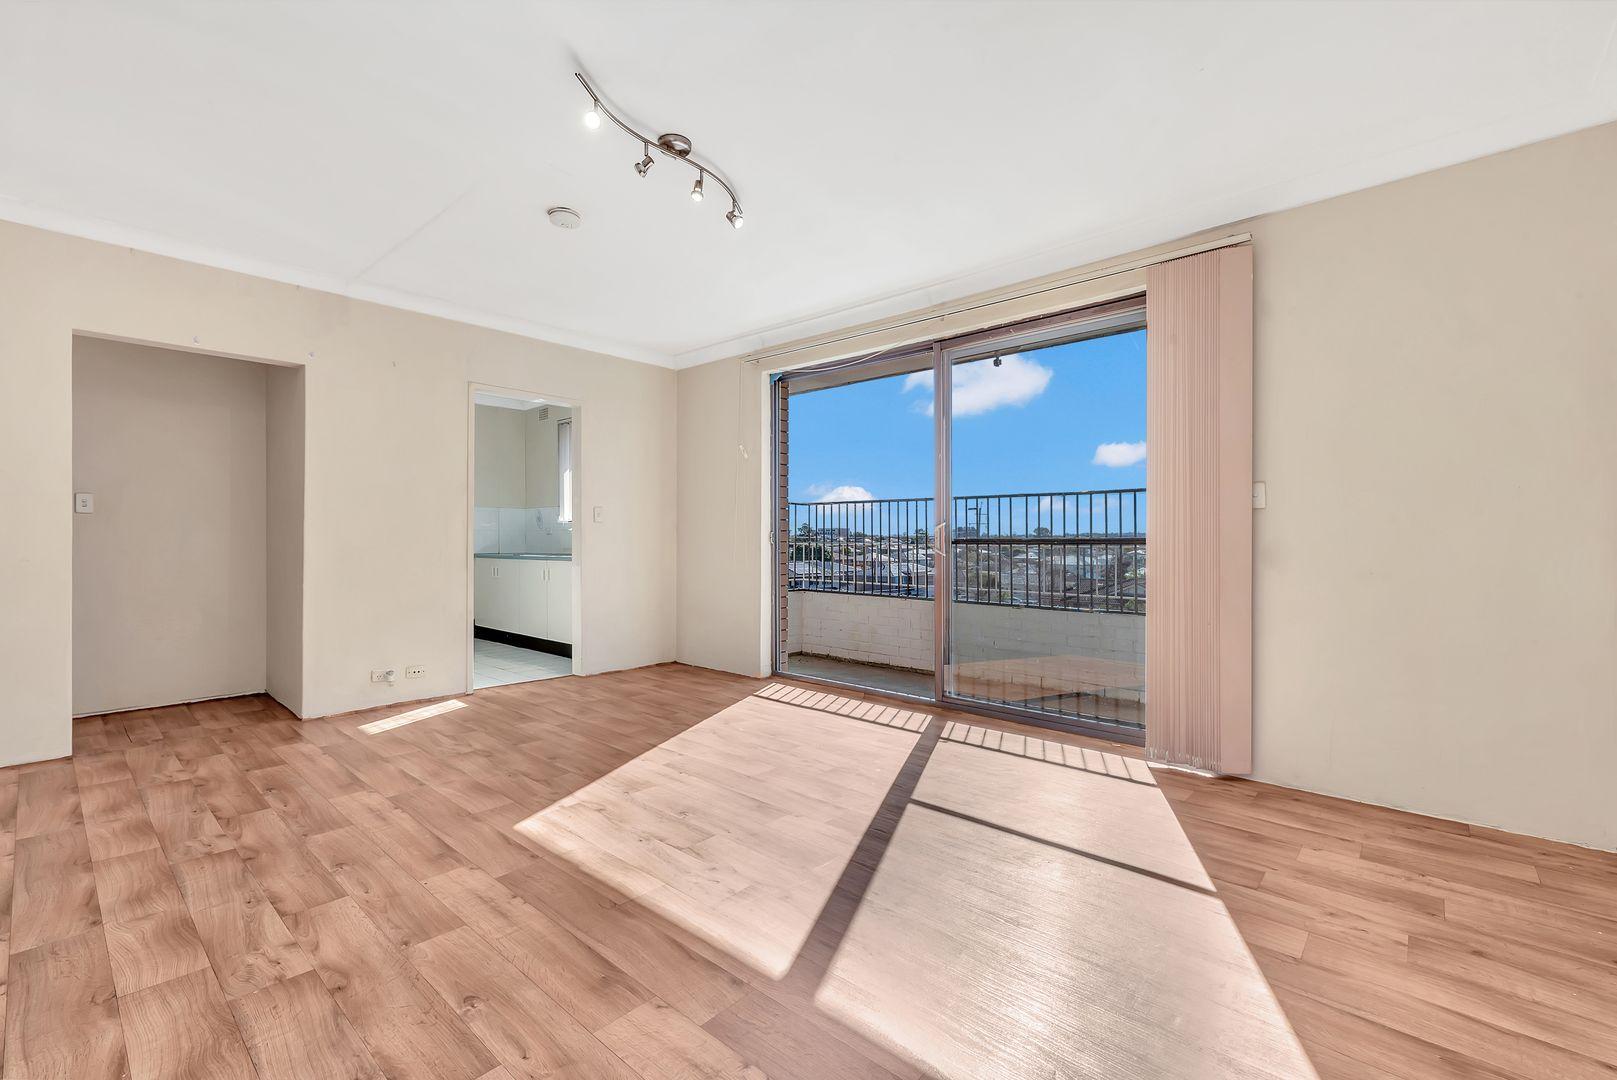 46/73 Mcburney Road, Cabramatta NSW 2166, Image 0